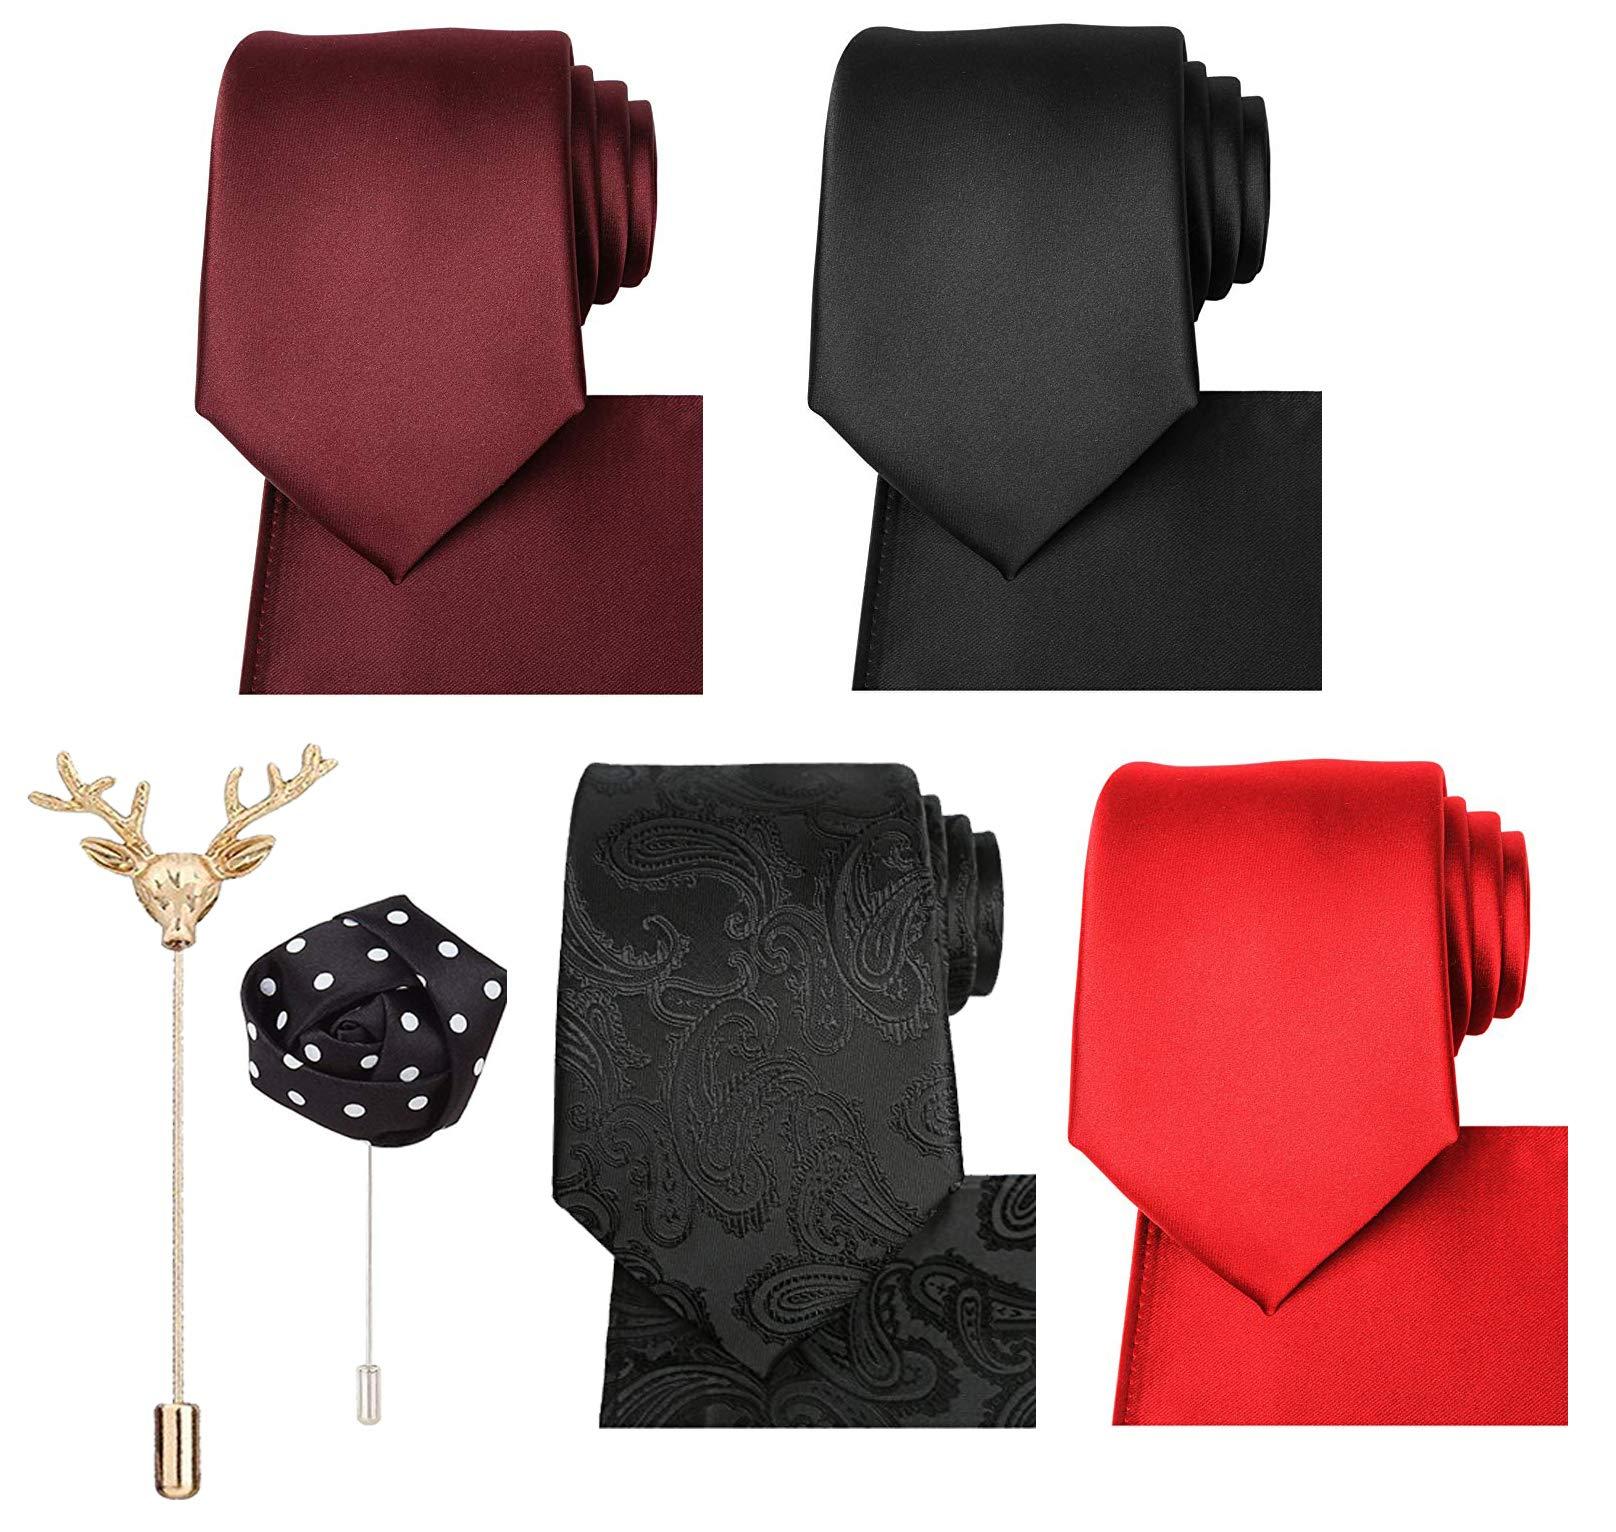 cc220966e8a9 Sorella'z Mens Partywear Neckties & Pocket Square Combo (Multicolors Combo)  with Lapels